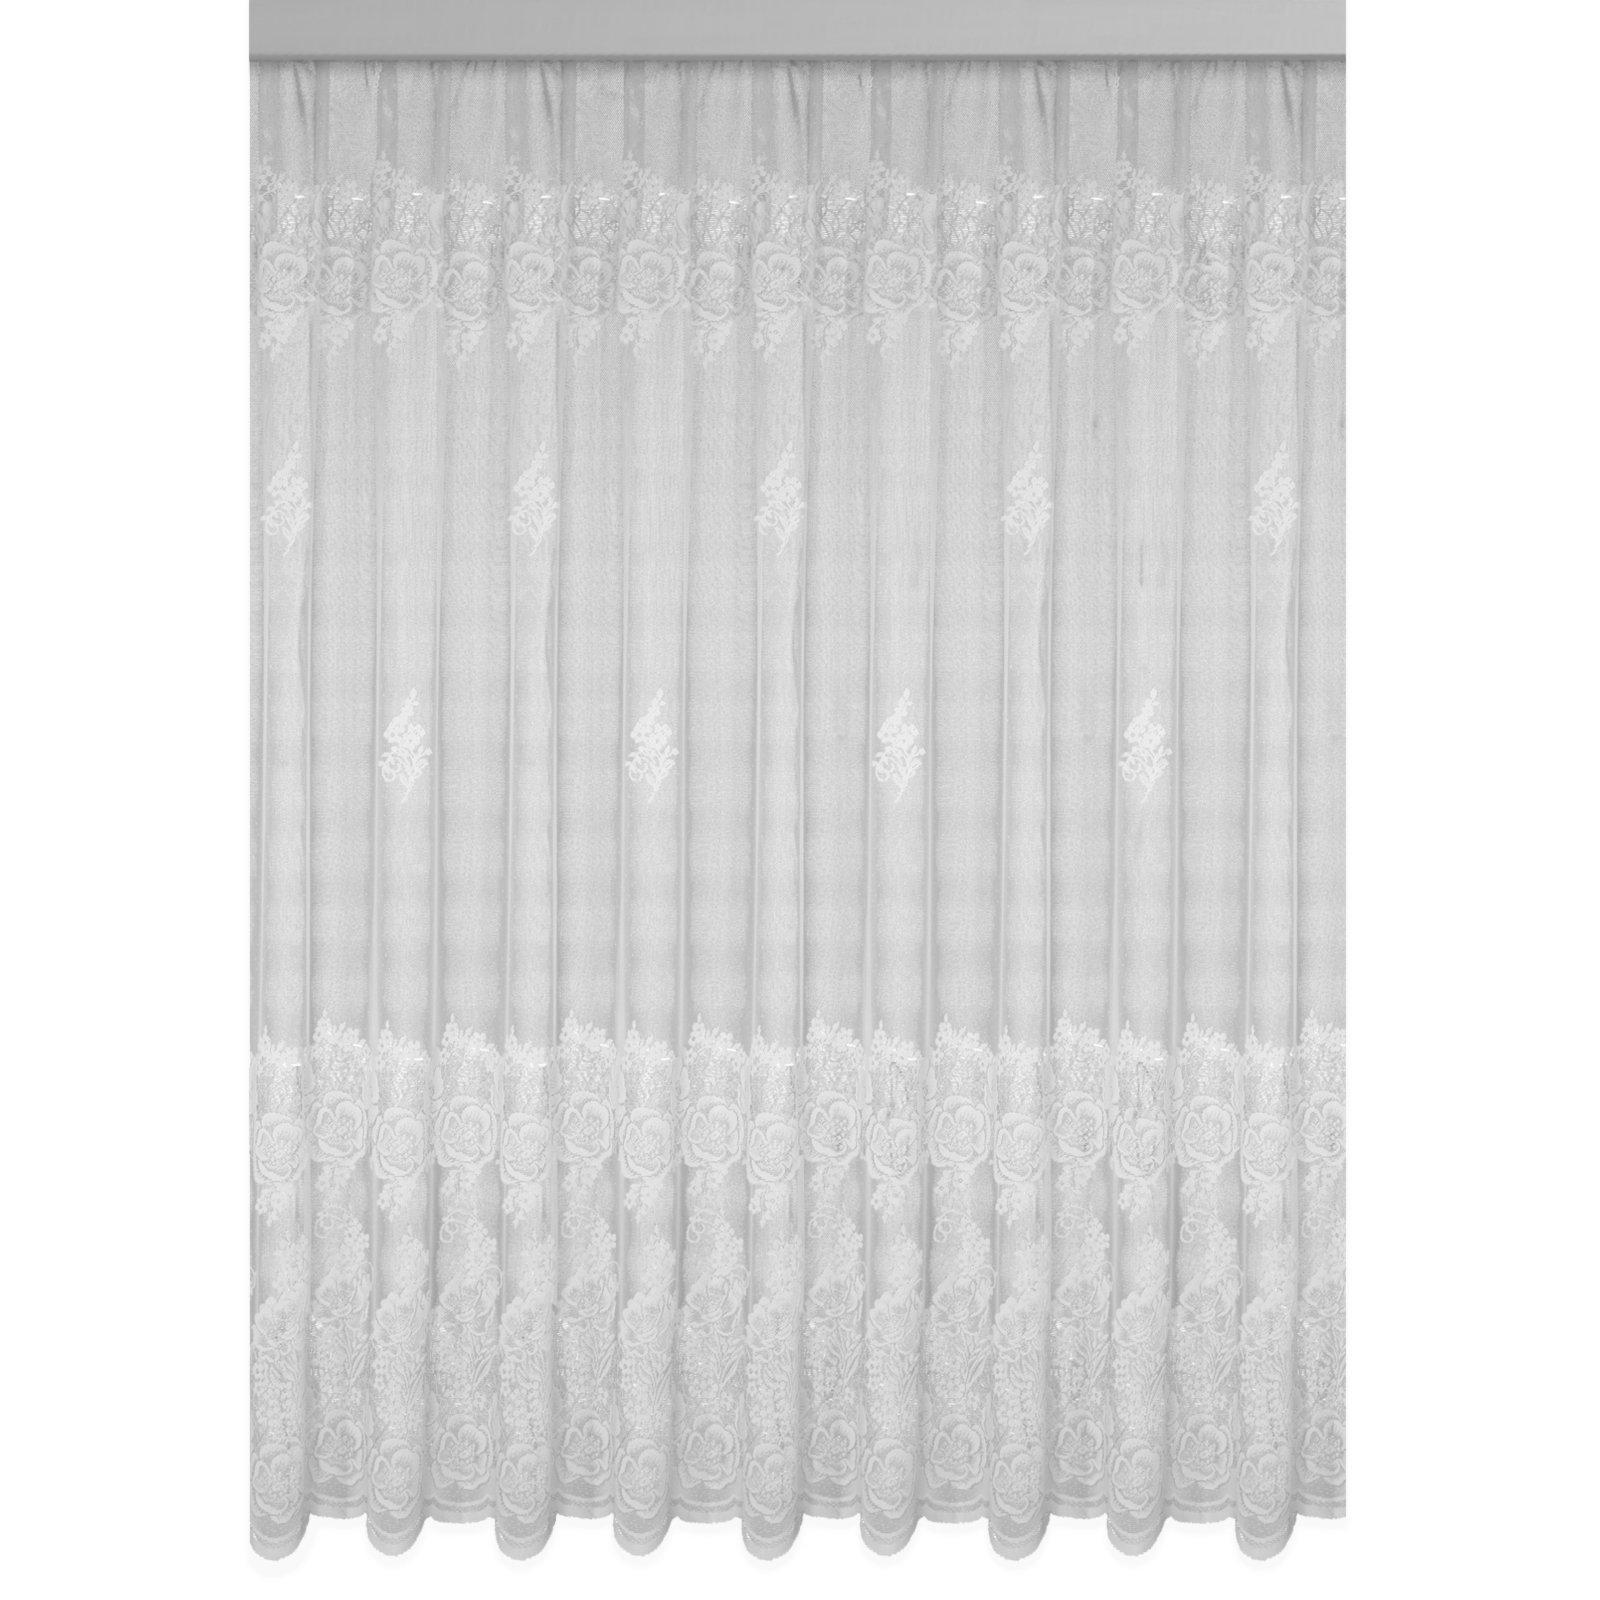 Gardine VERONA - Jaquard-Store - weiß - 450x175 cm